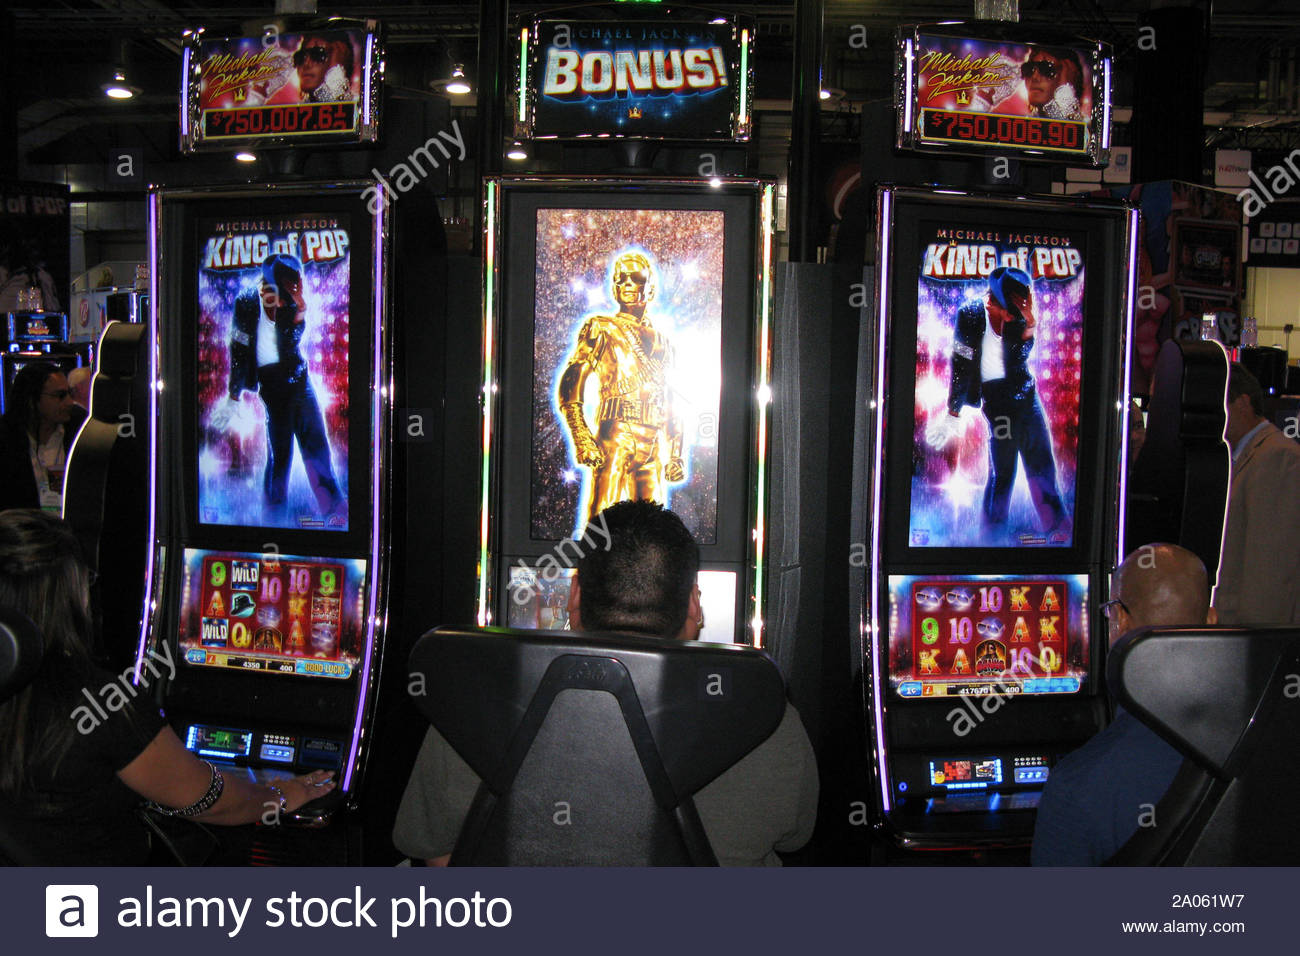 kwin casino online malaysia